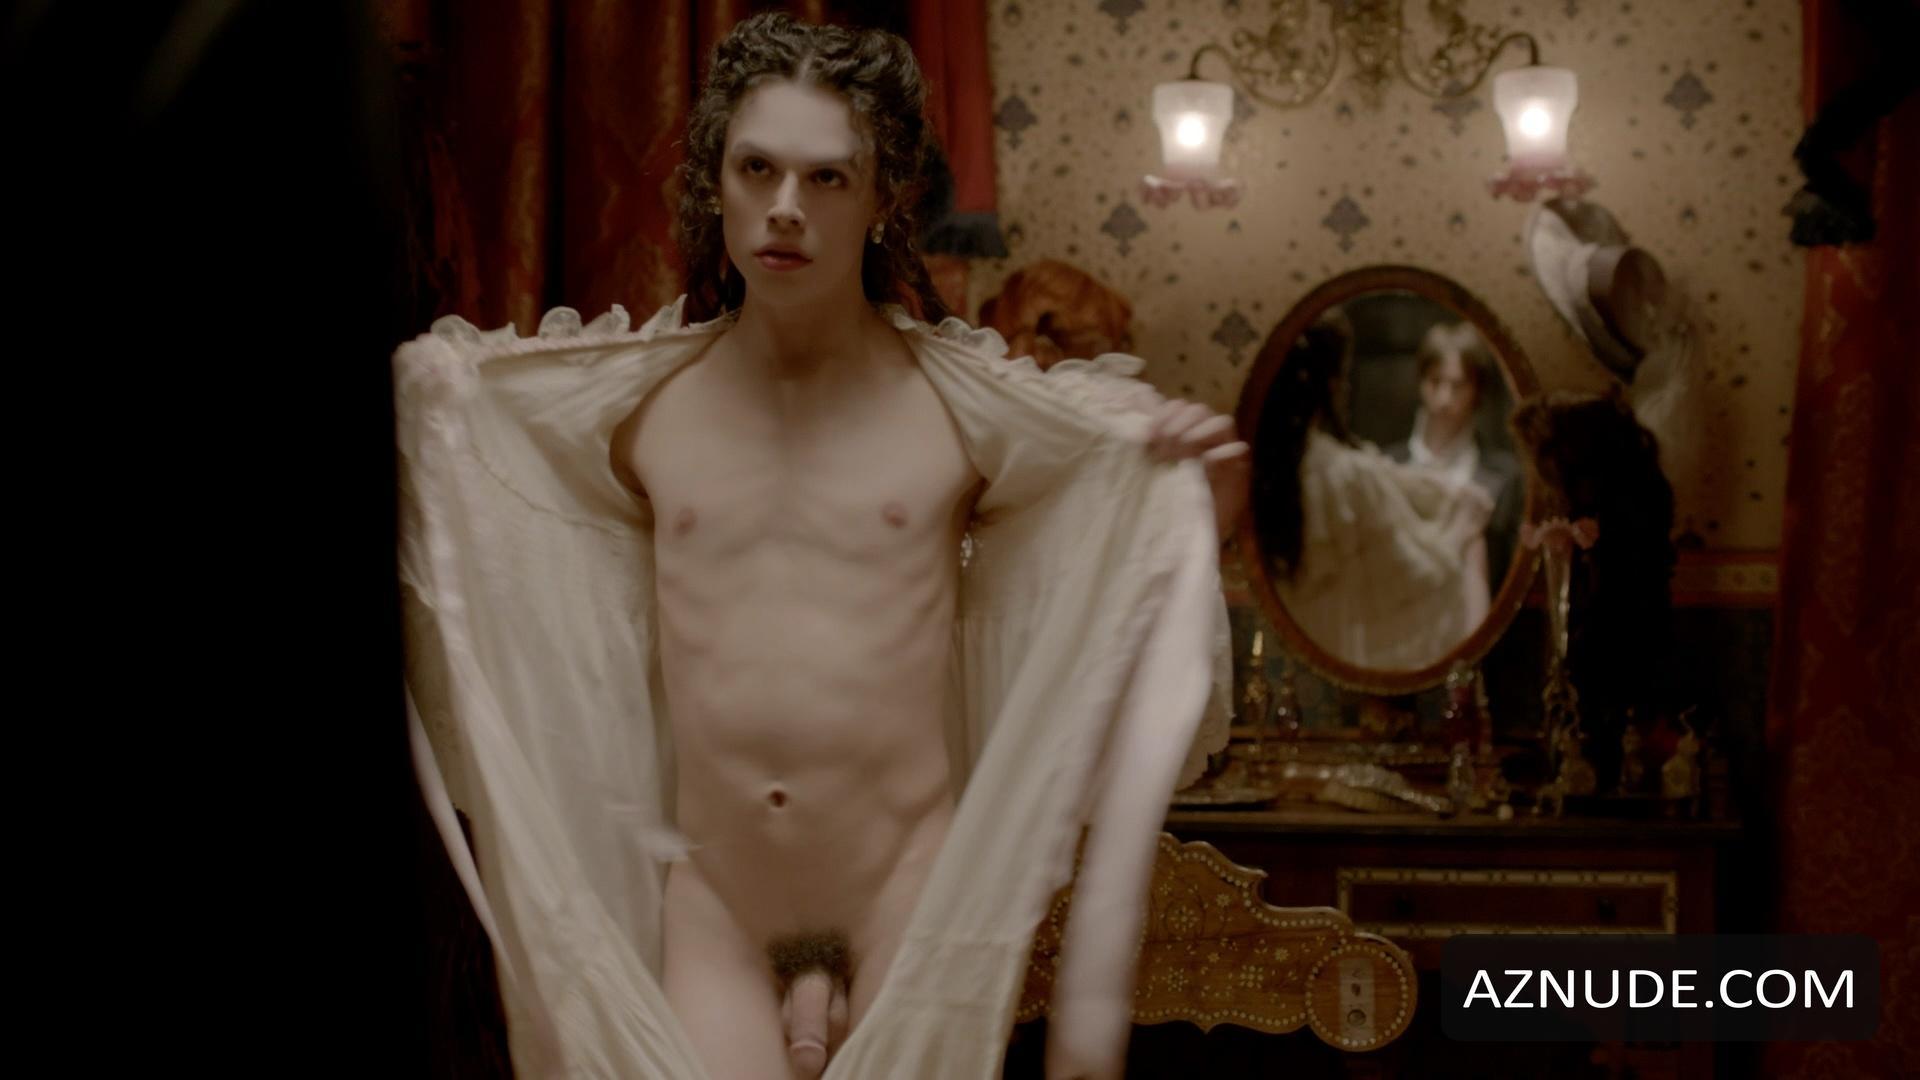 jonny beauchamp nude - aznude men